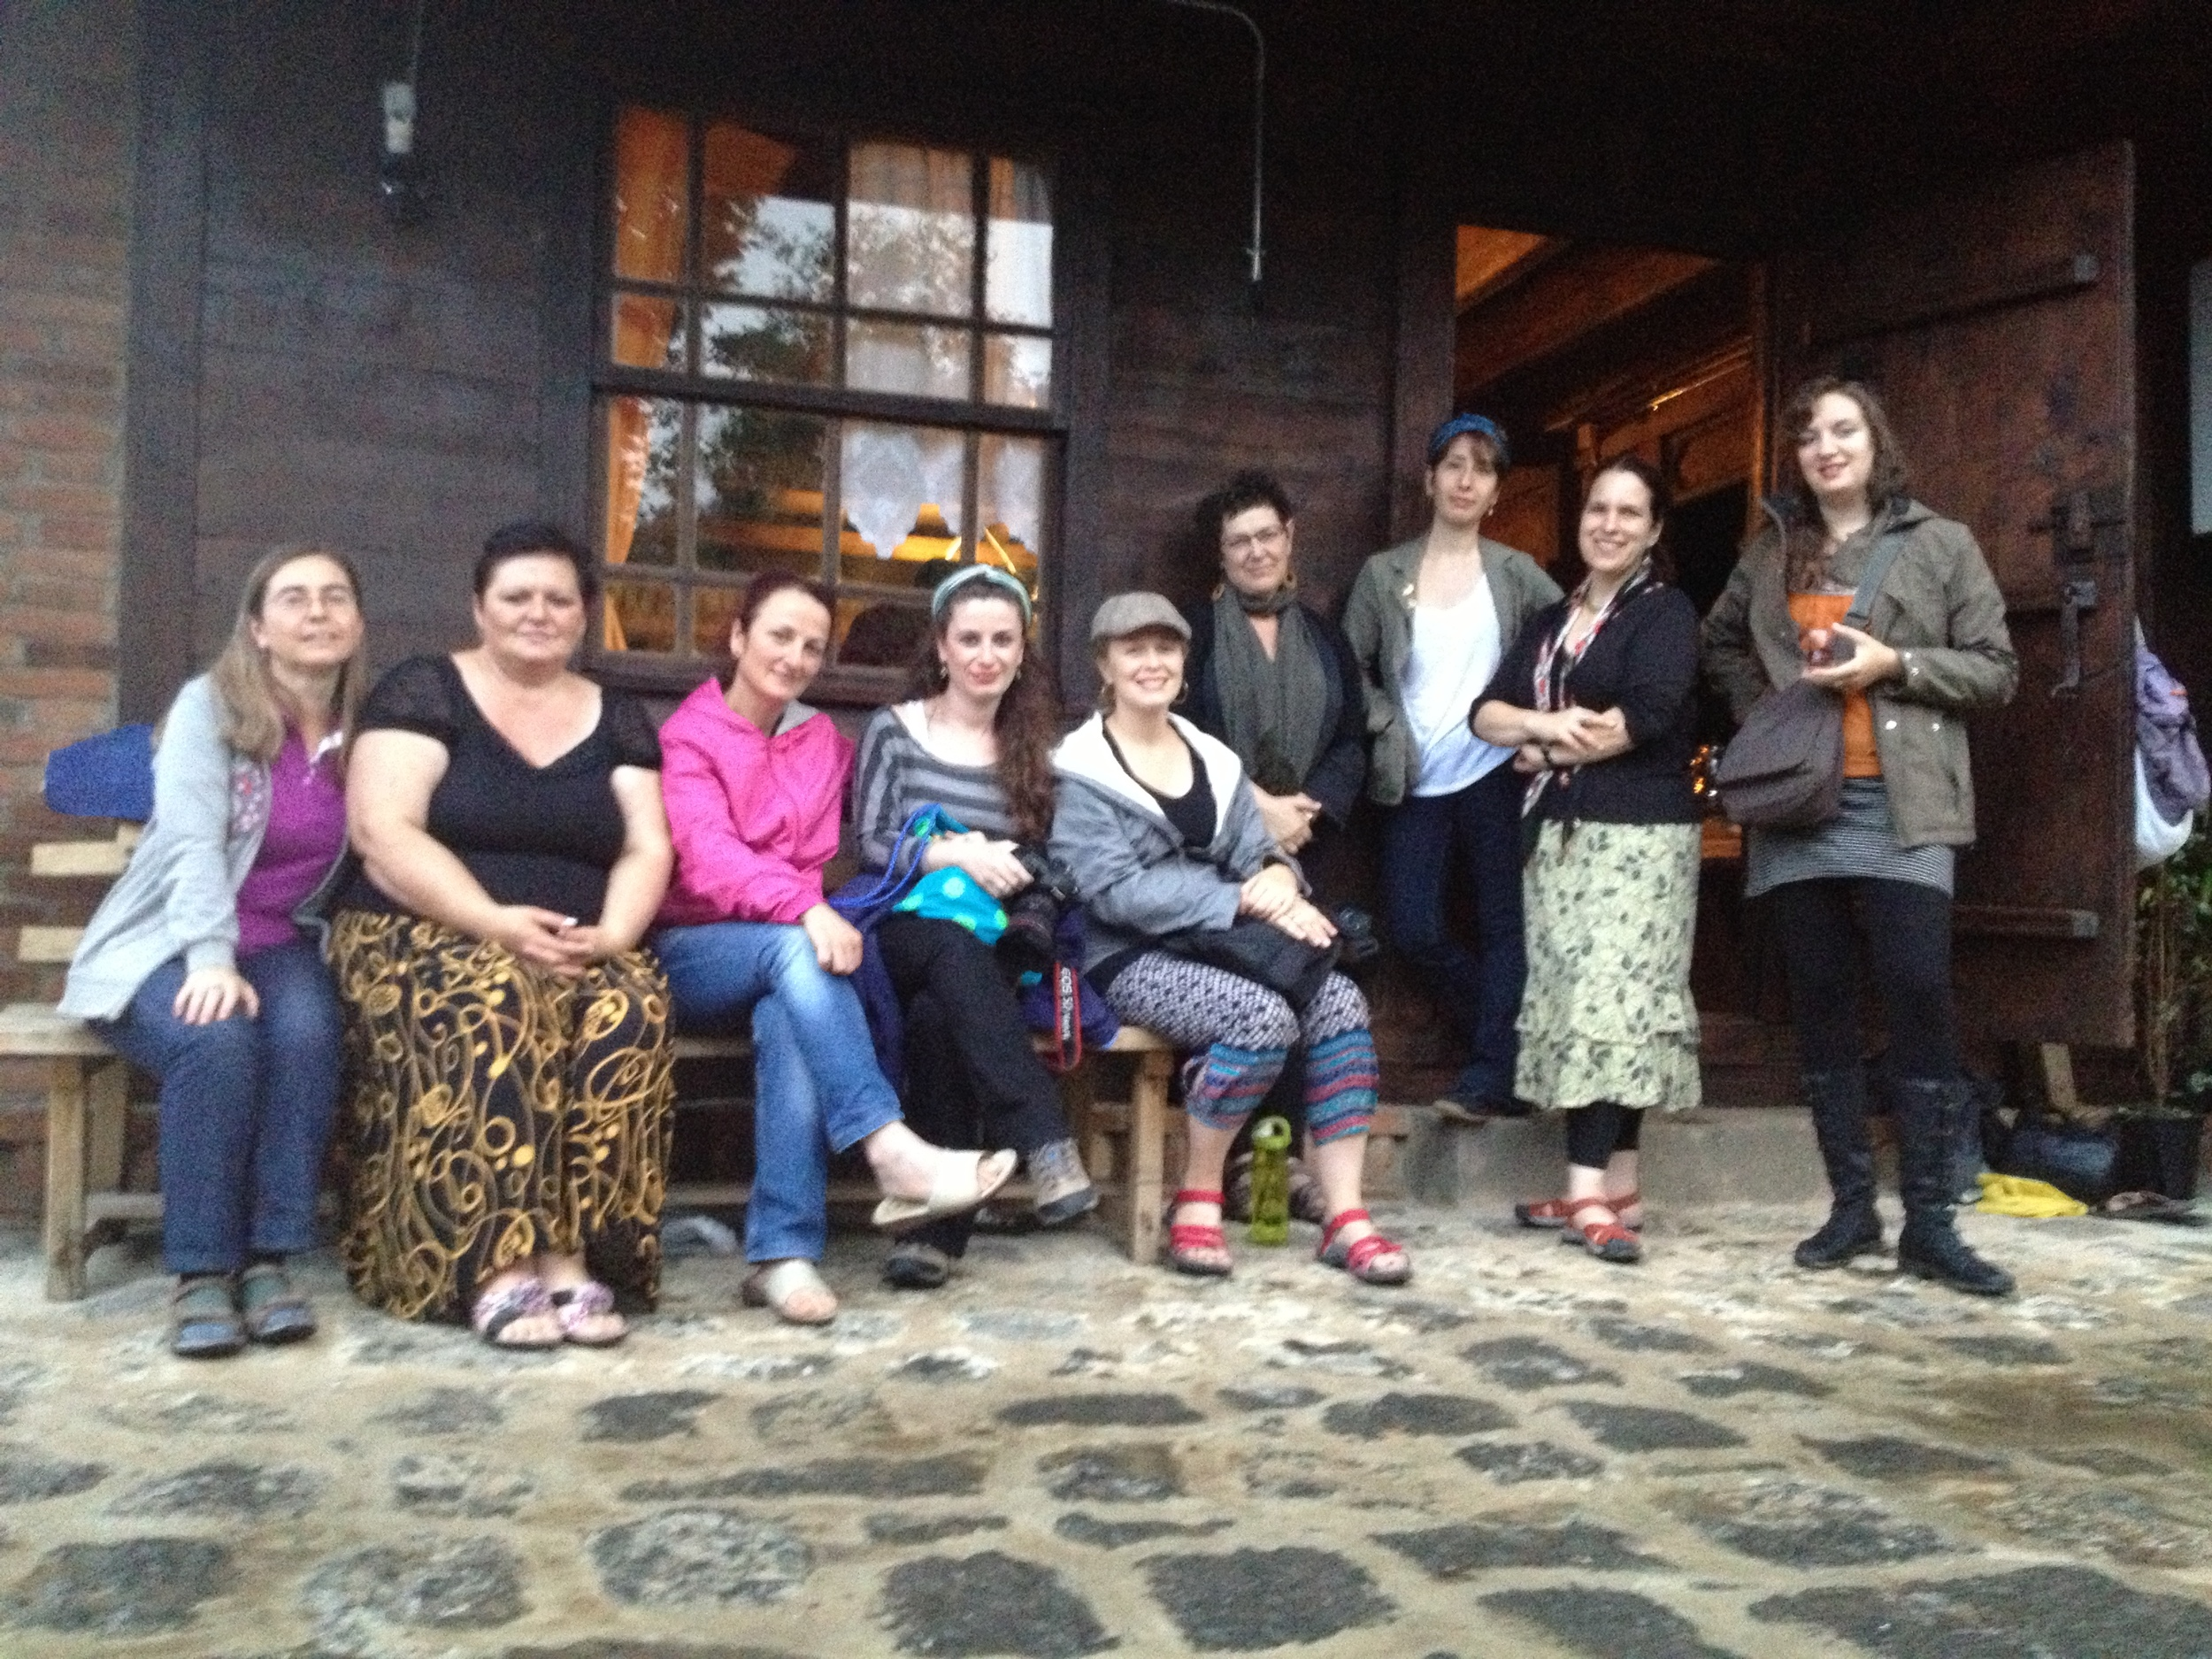 Lili Abdulişi,Güler Topaloğlu,members of Kitka Women's Vocal Ensemble and friends in Arhavi, Turkey 2013